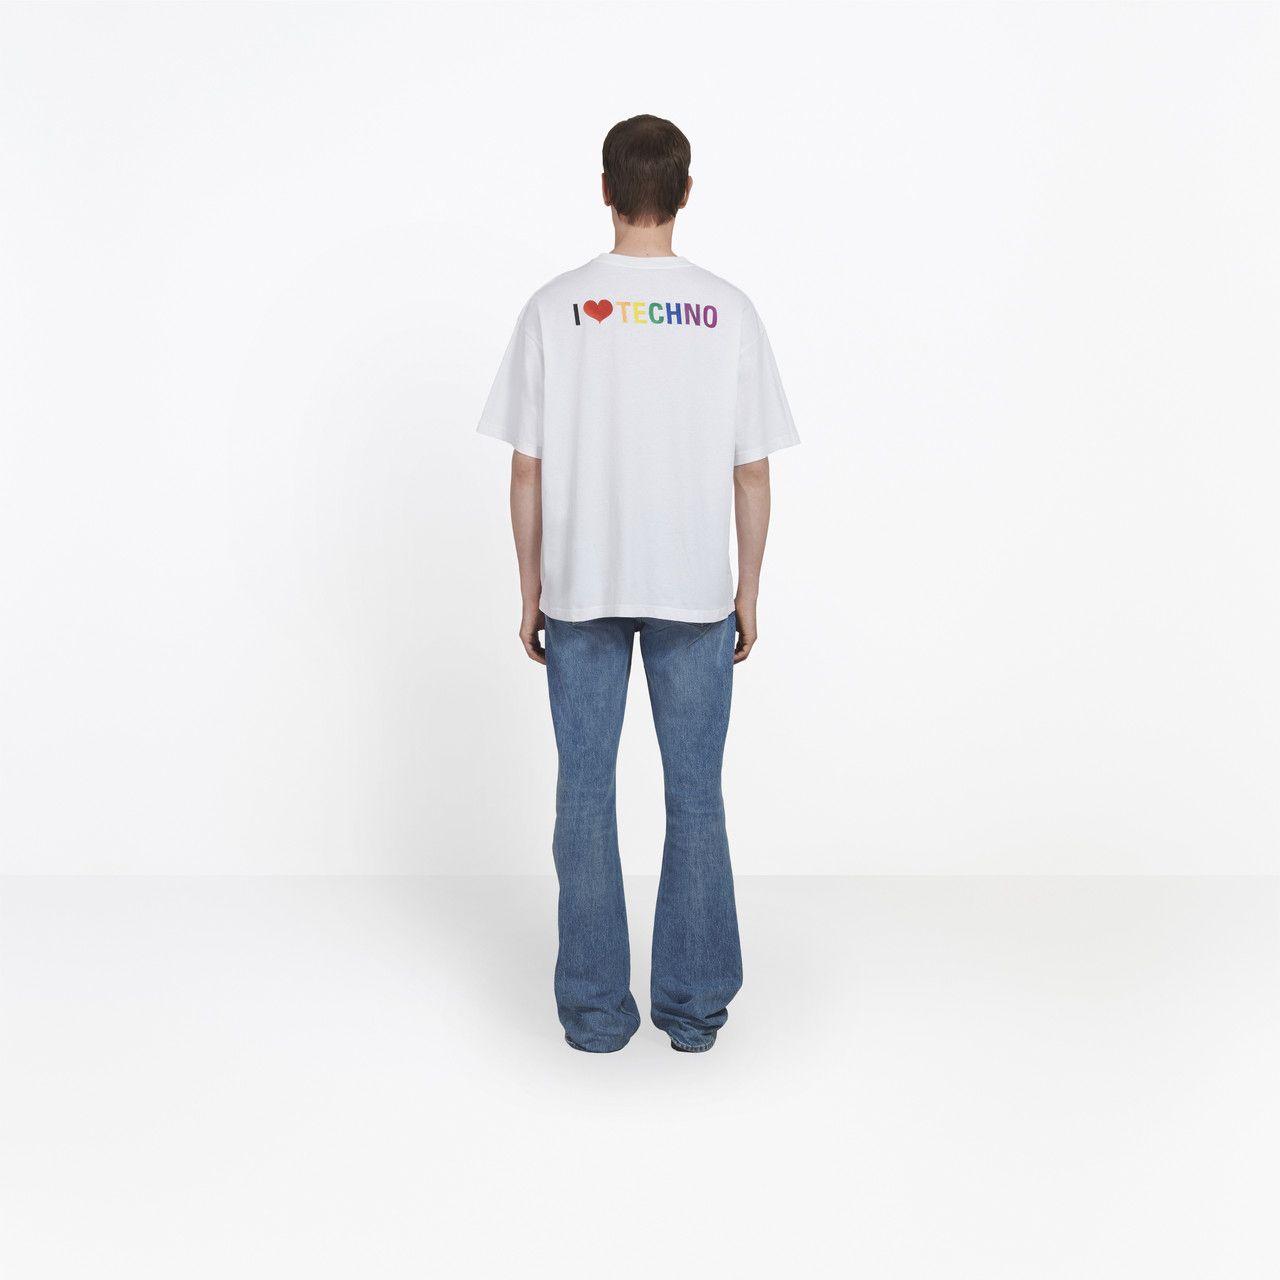 Fashion Mens Women T Shirt With I Love